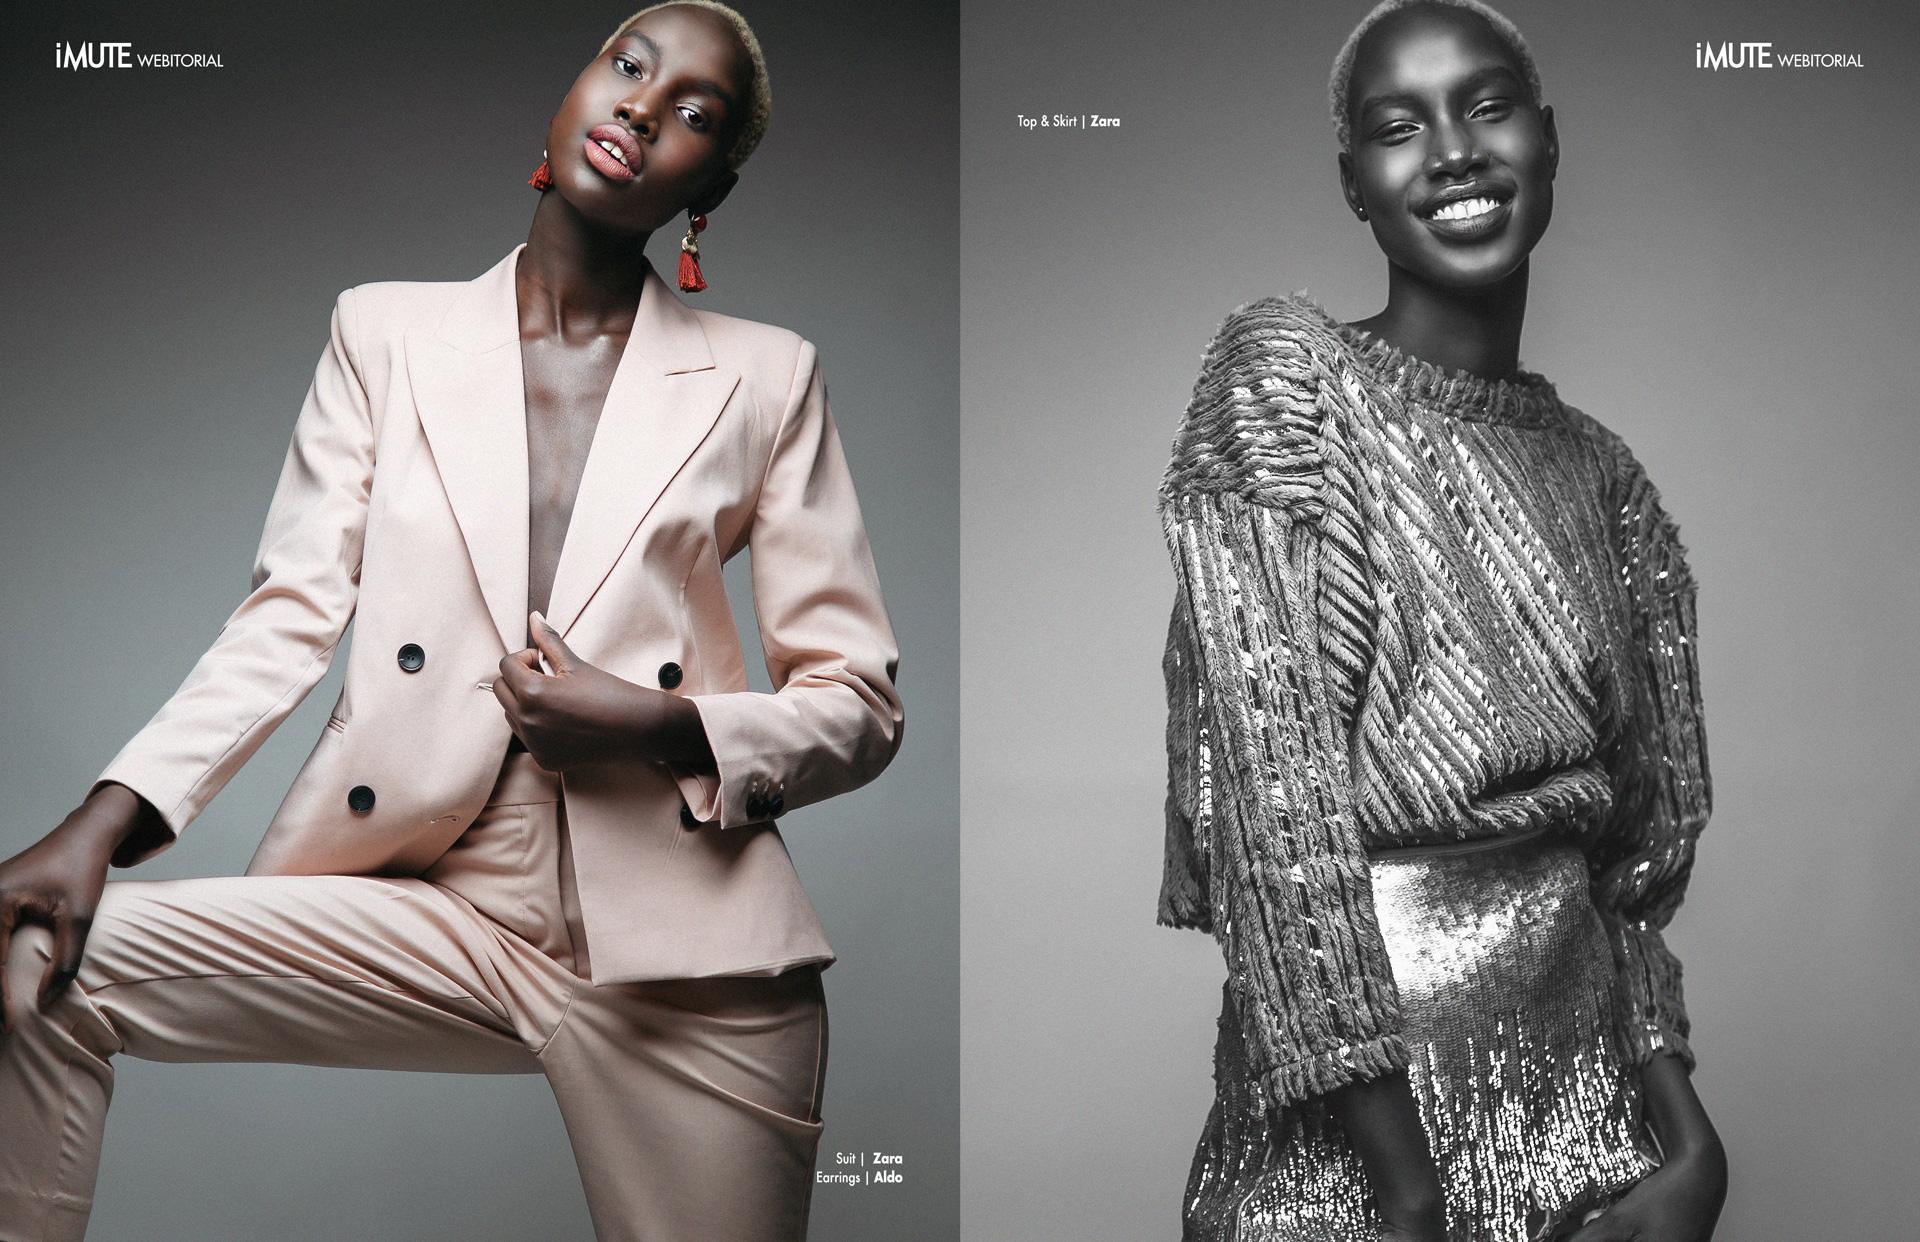 Coral Swish webitorial for iMute Magazine Photographer|Jian Von Esmane Model| Nya Gatbel @The Nobles Management Stylist| Cach Cruz Makeup| Katina Nicolaou